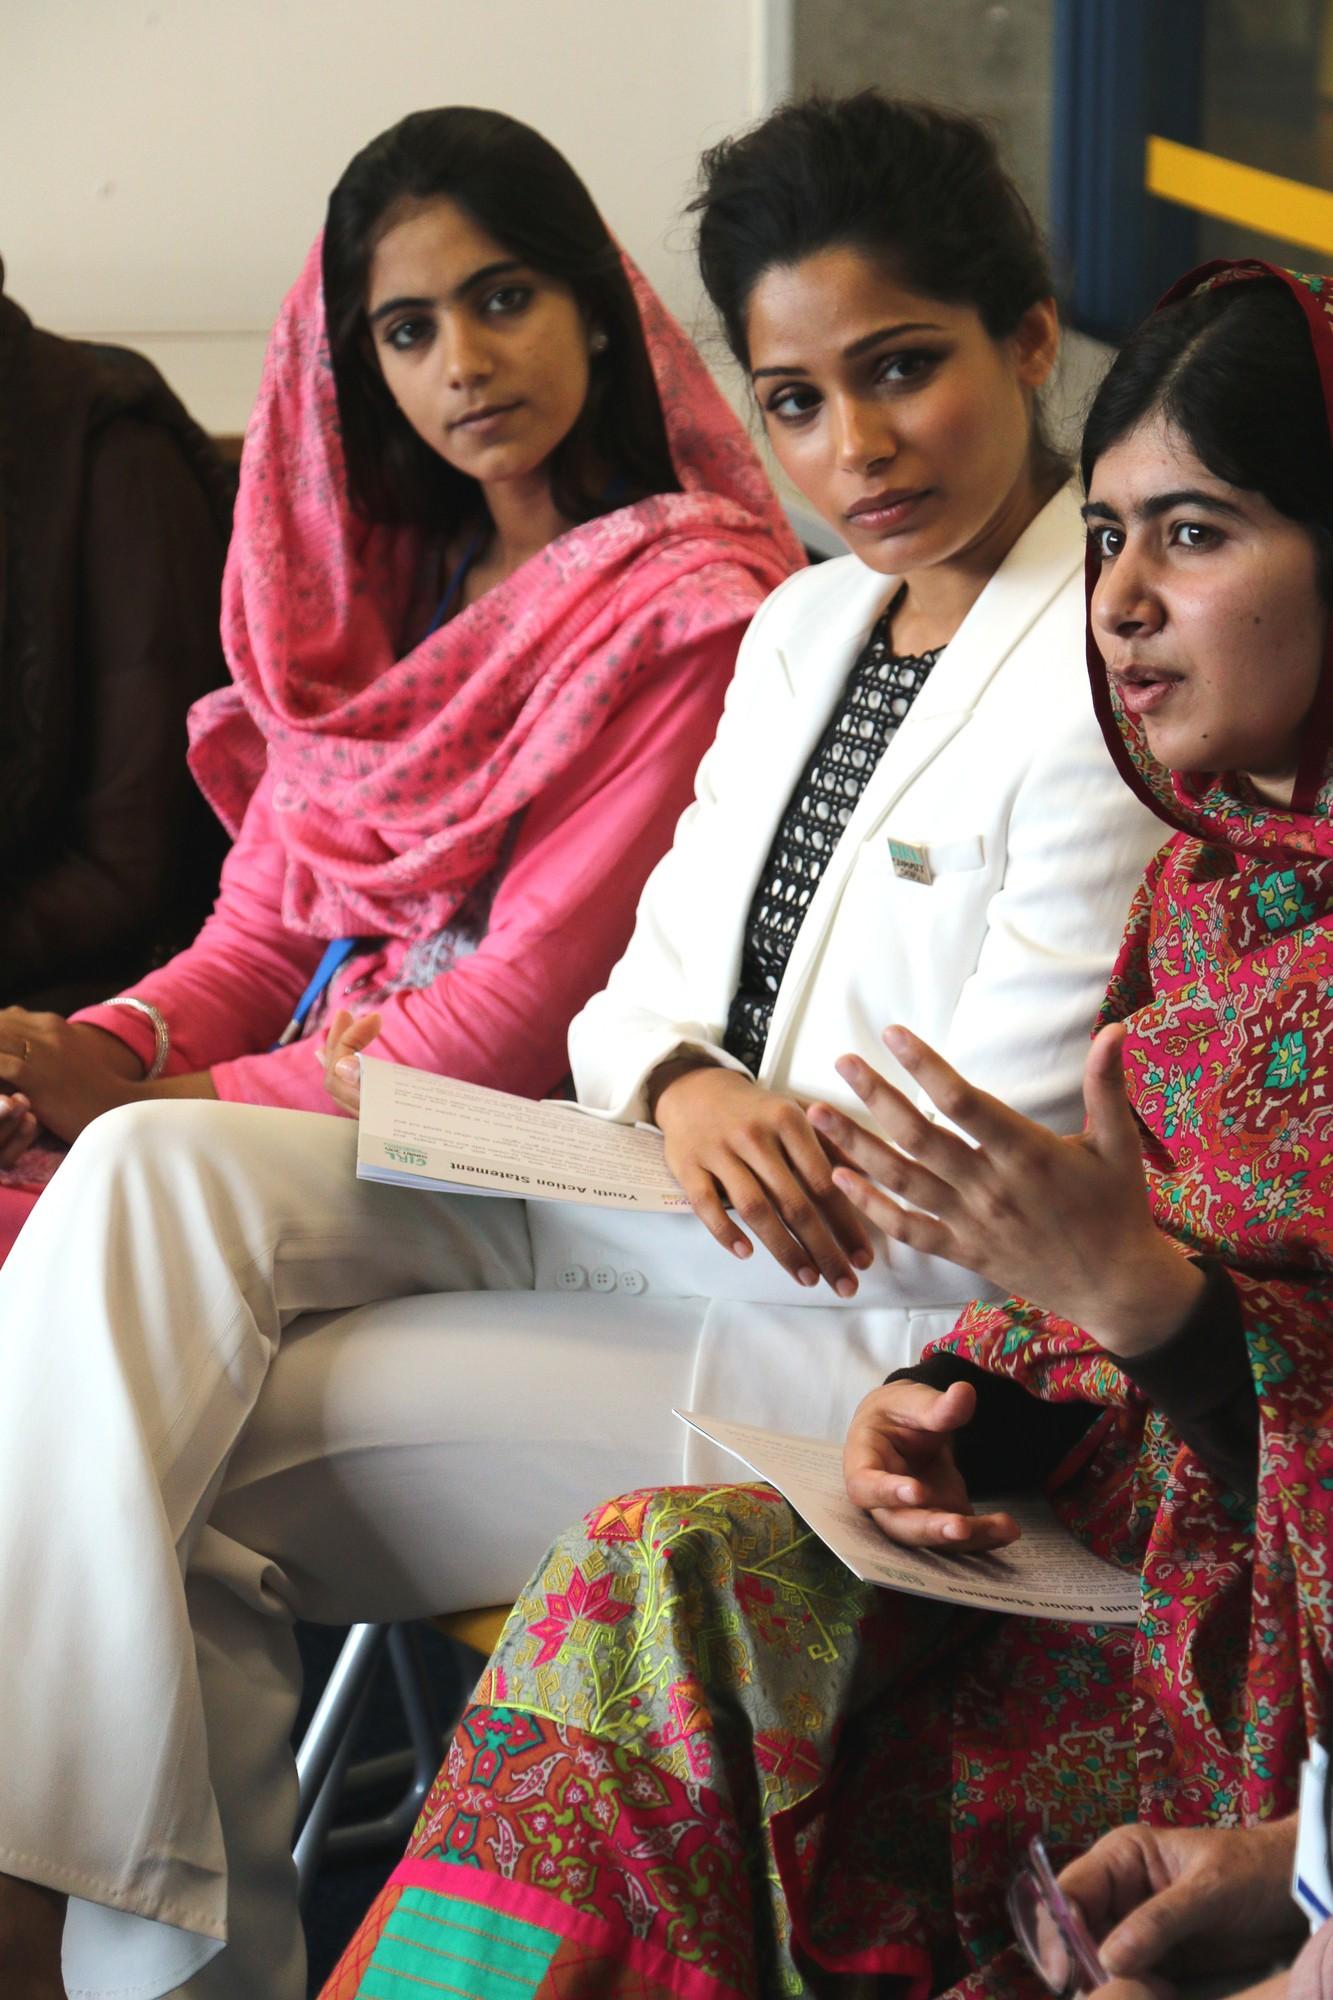 Plan Pakistan youth campaigner and Freida Pinto listen to Malala Yousafzai speak